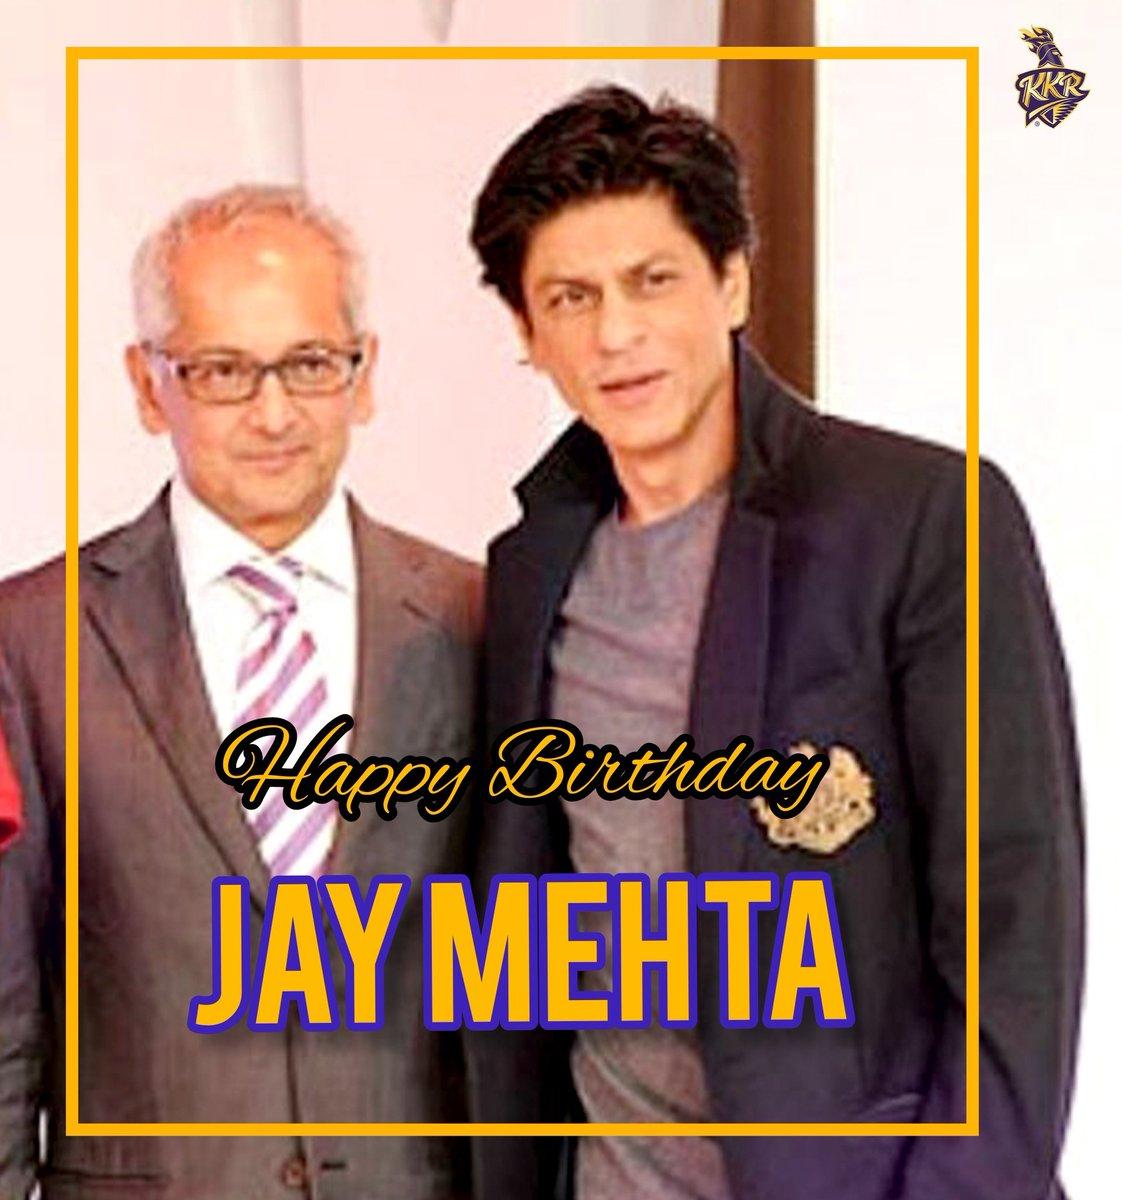 Here's wishing #JayMehta sir a very happy birthday good & health! ❤️ #HappyBirthdayJayMehta   @KKRiders